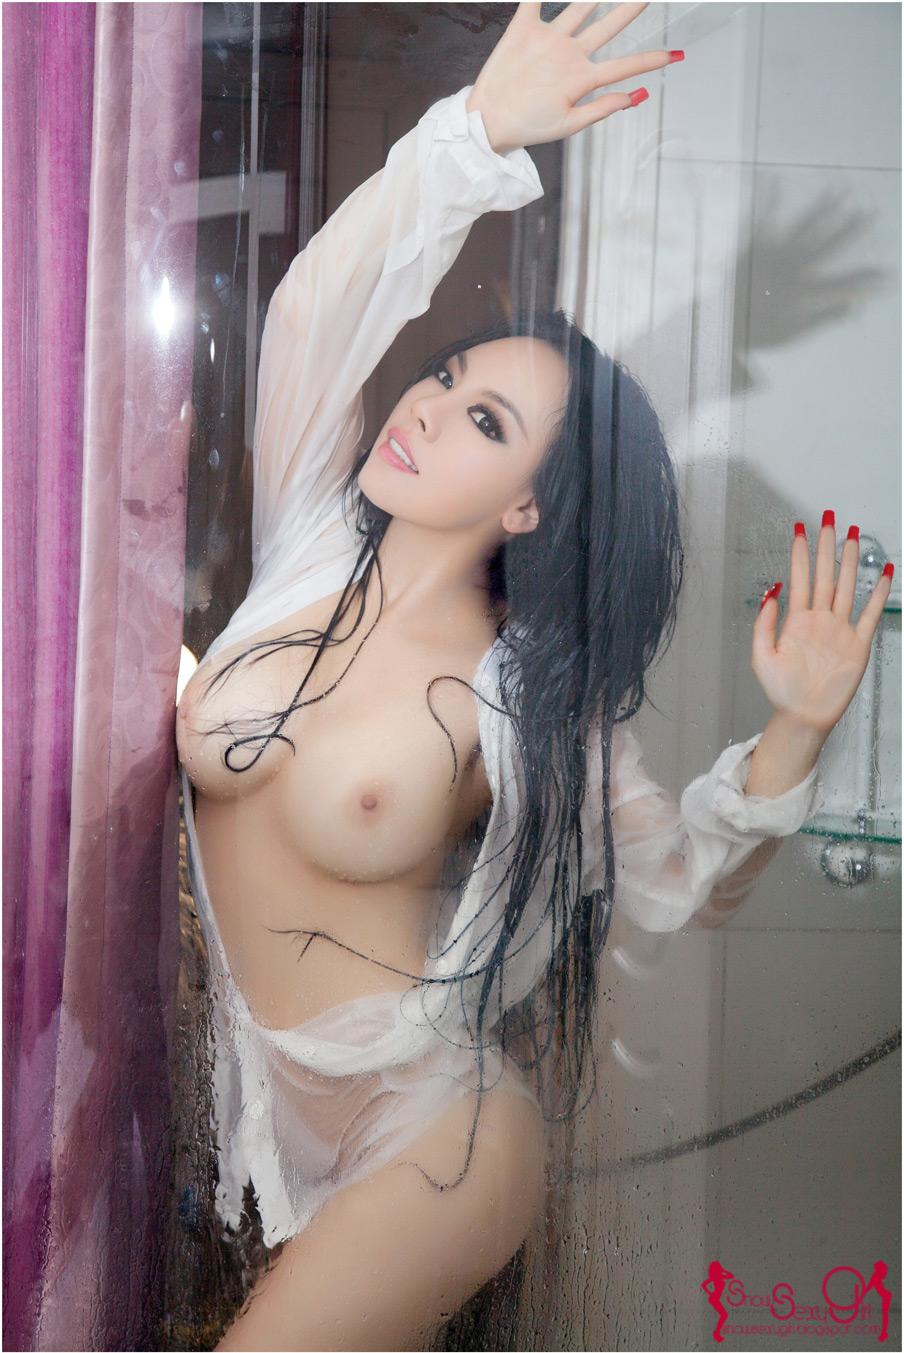 world hottest cheerleader nude